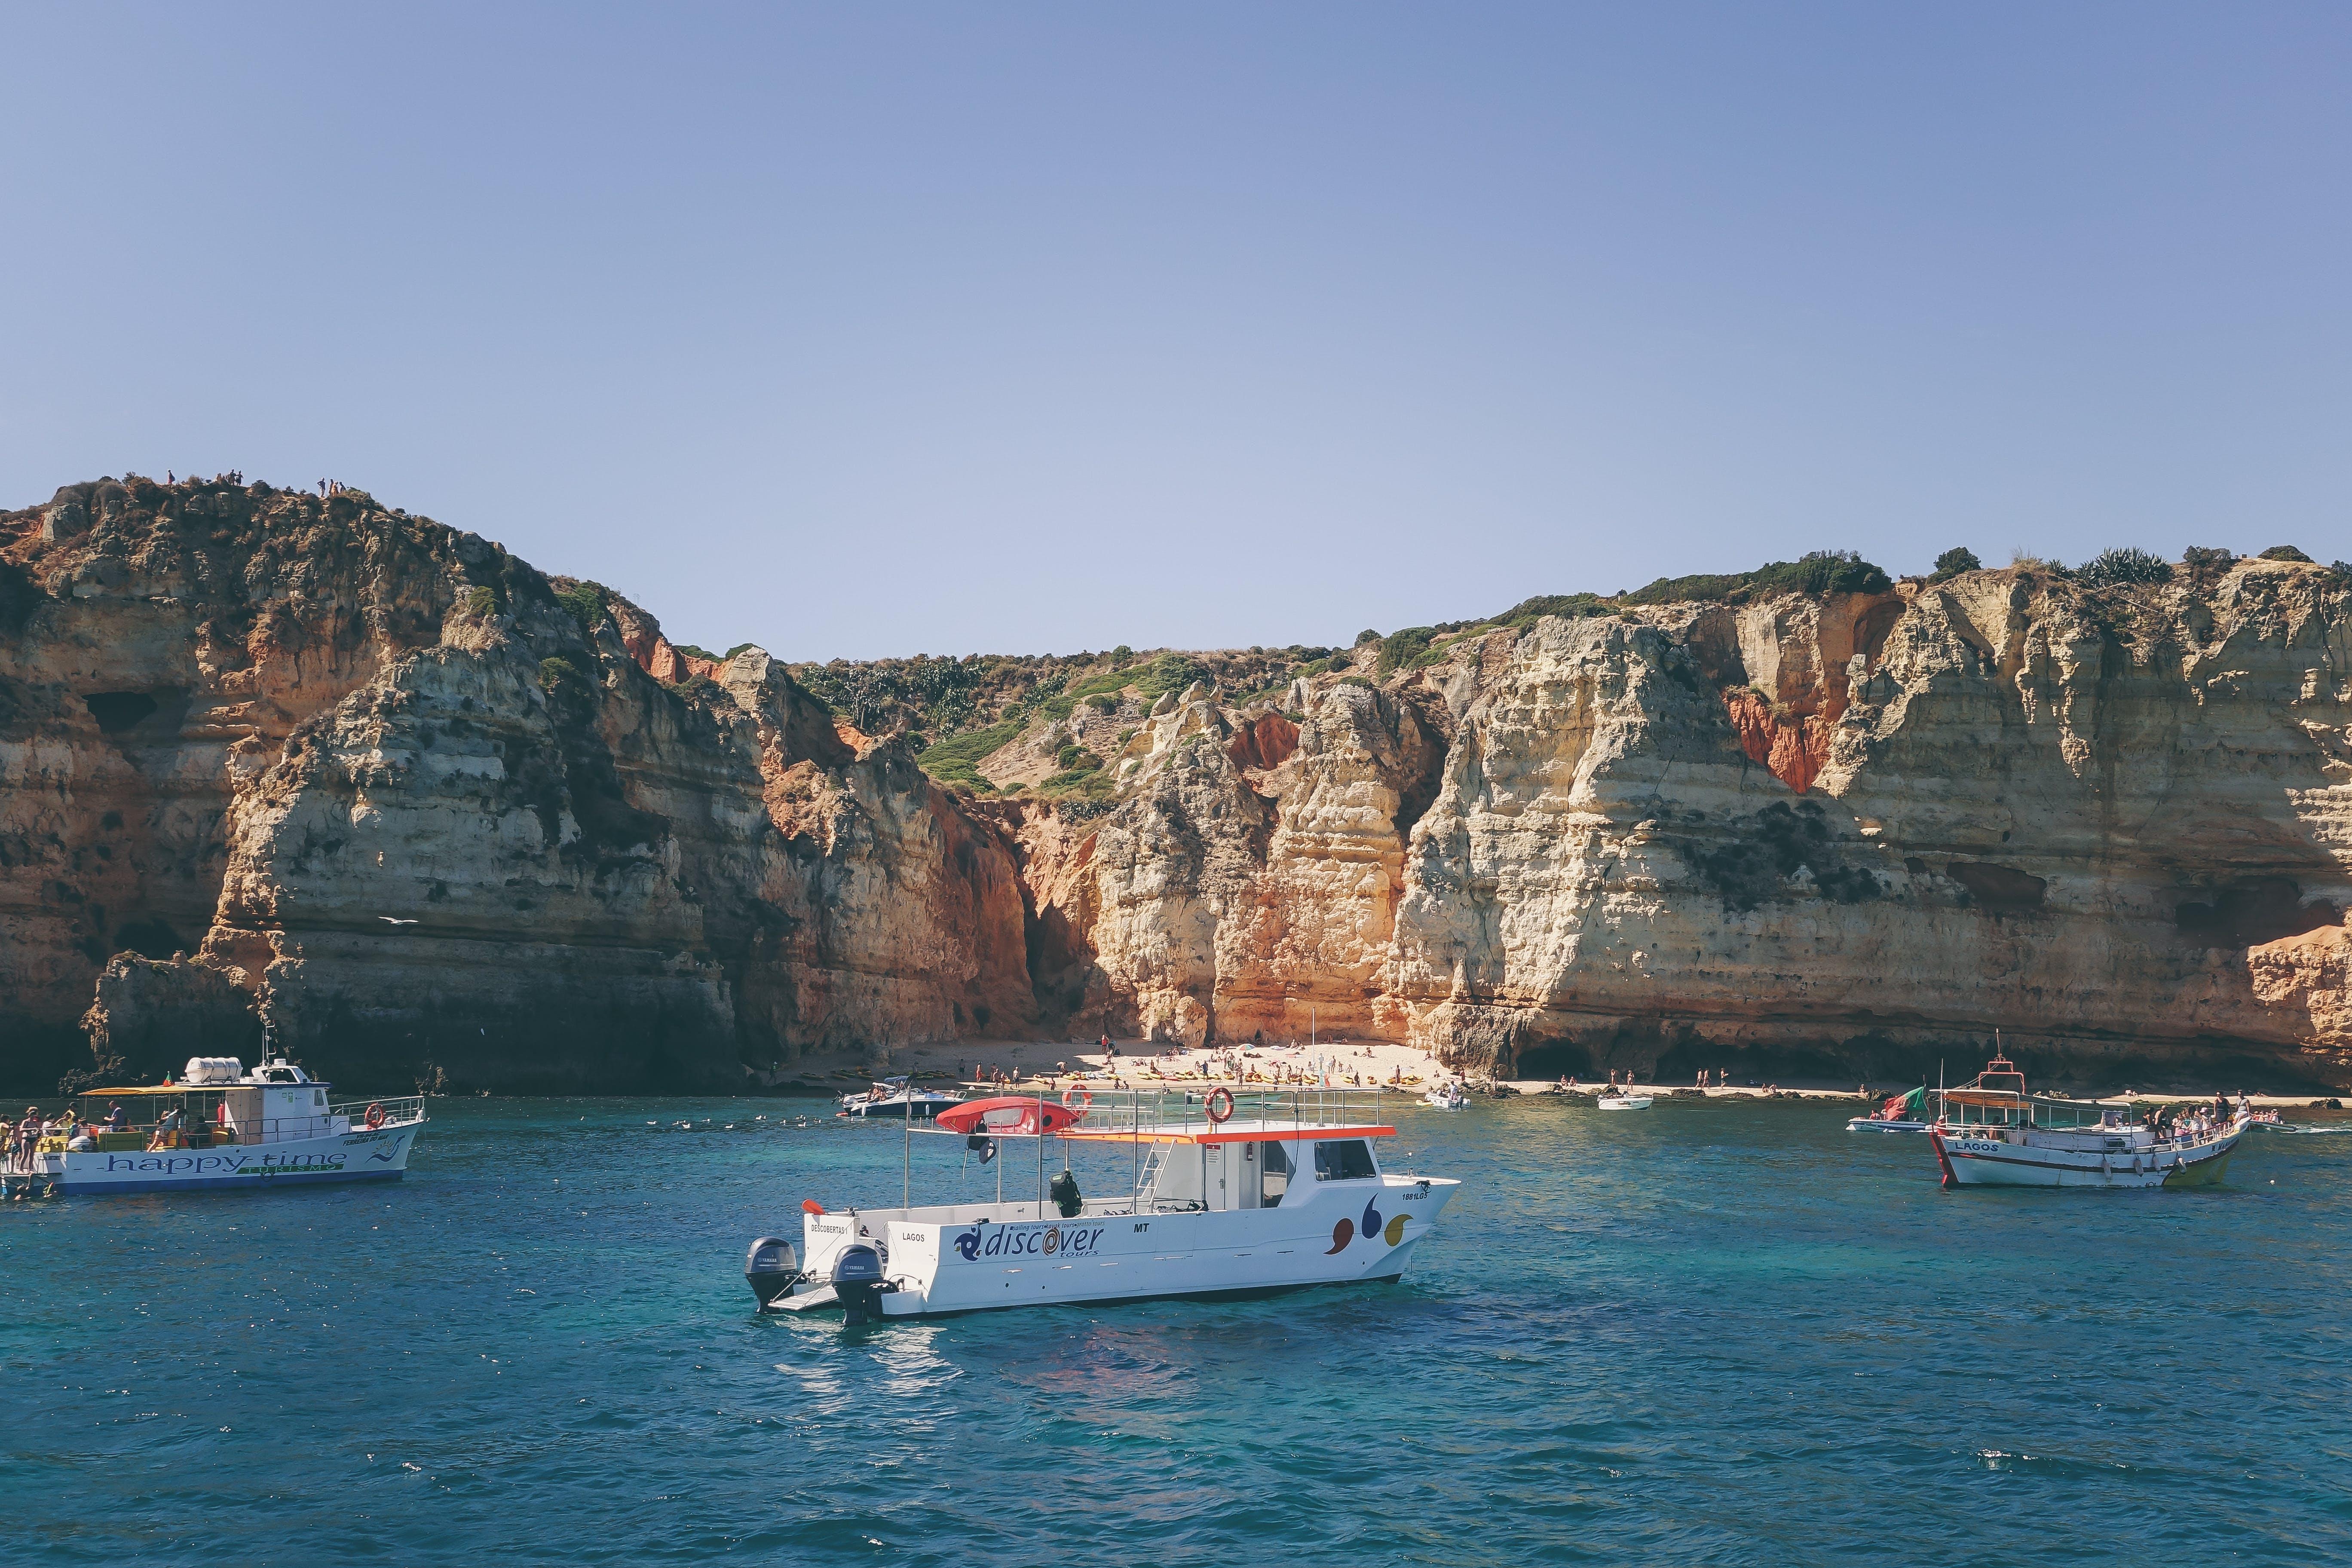 Gratis arkivbilde med båter, hav, sjø, transportsystem